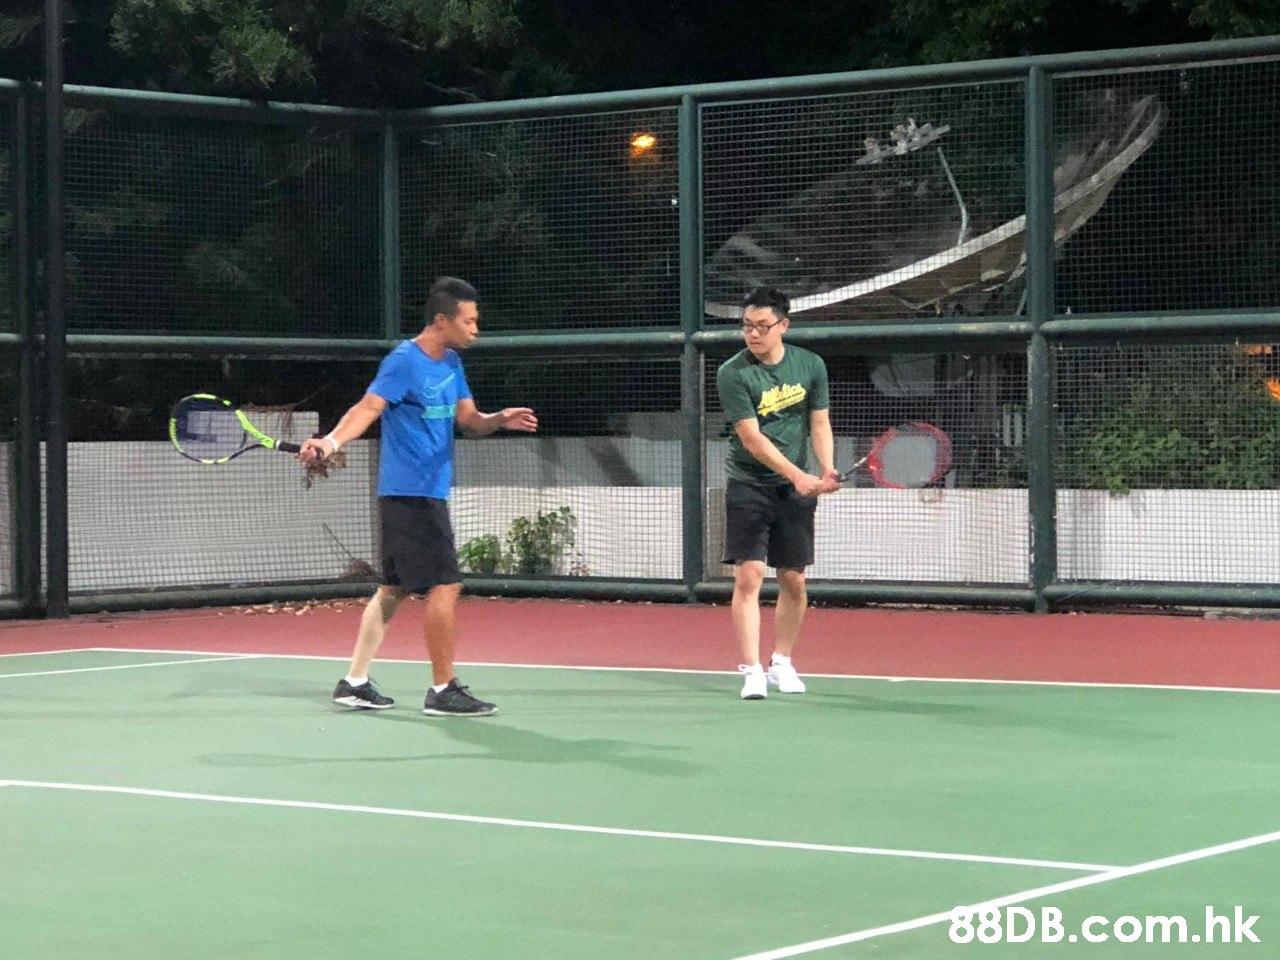 88D B.com.hk  Sports,Tennis,Tennis court,Sport venue,Net